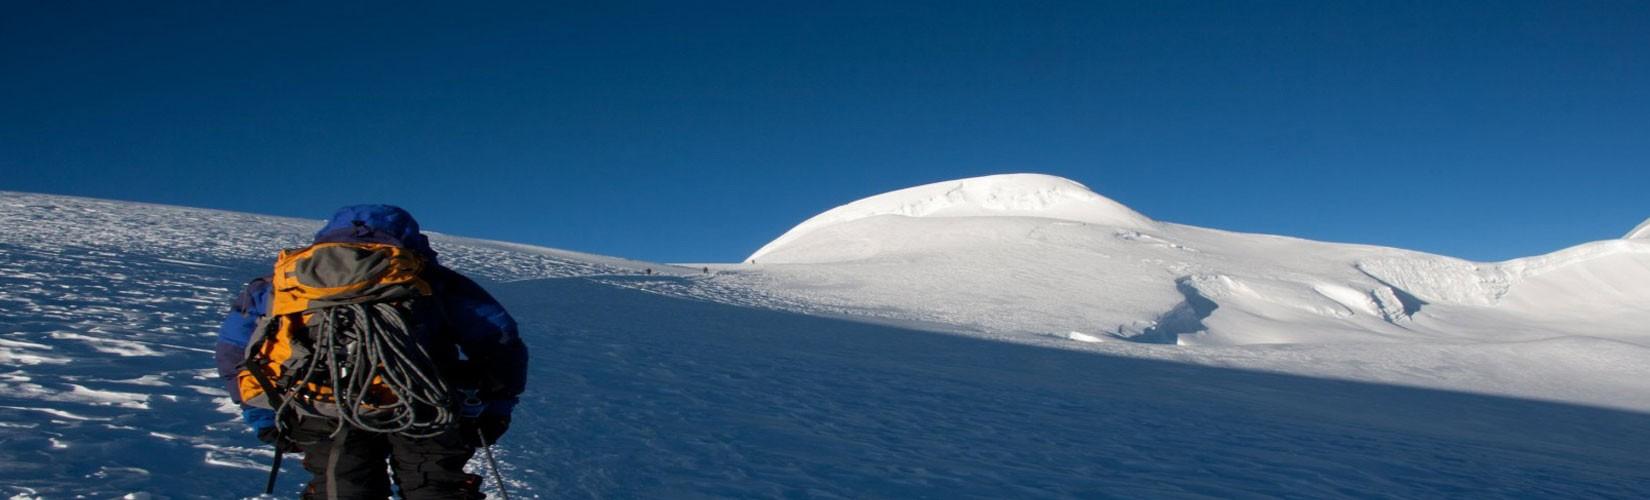 Island Peak Climbing Difficulty